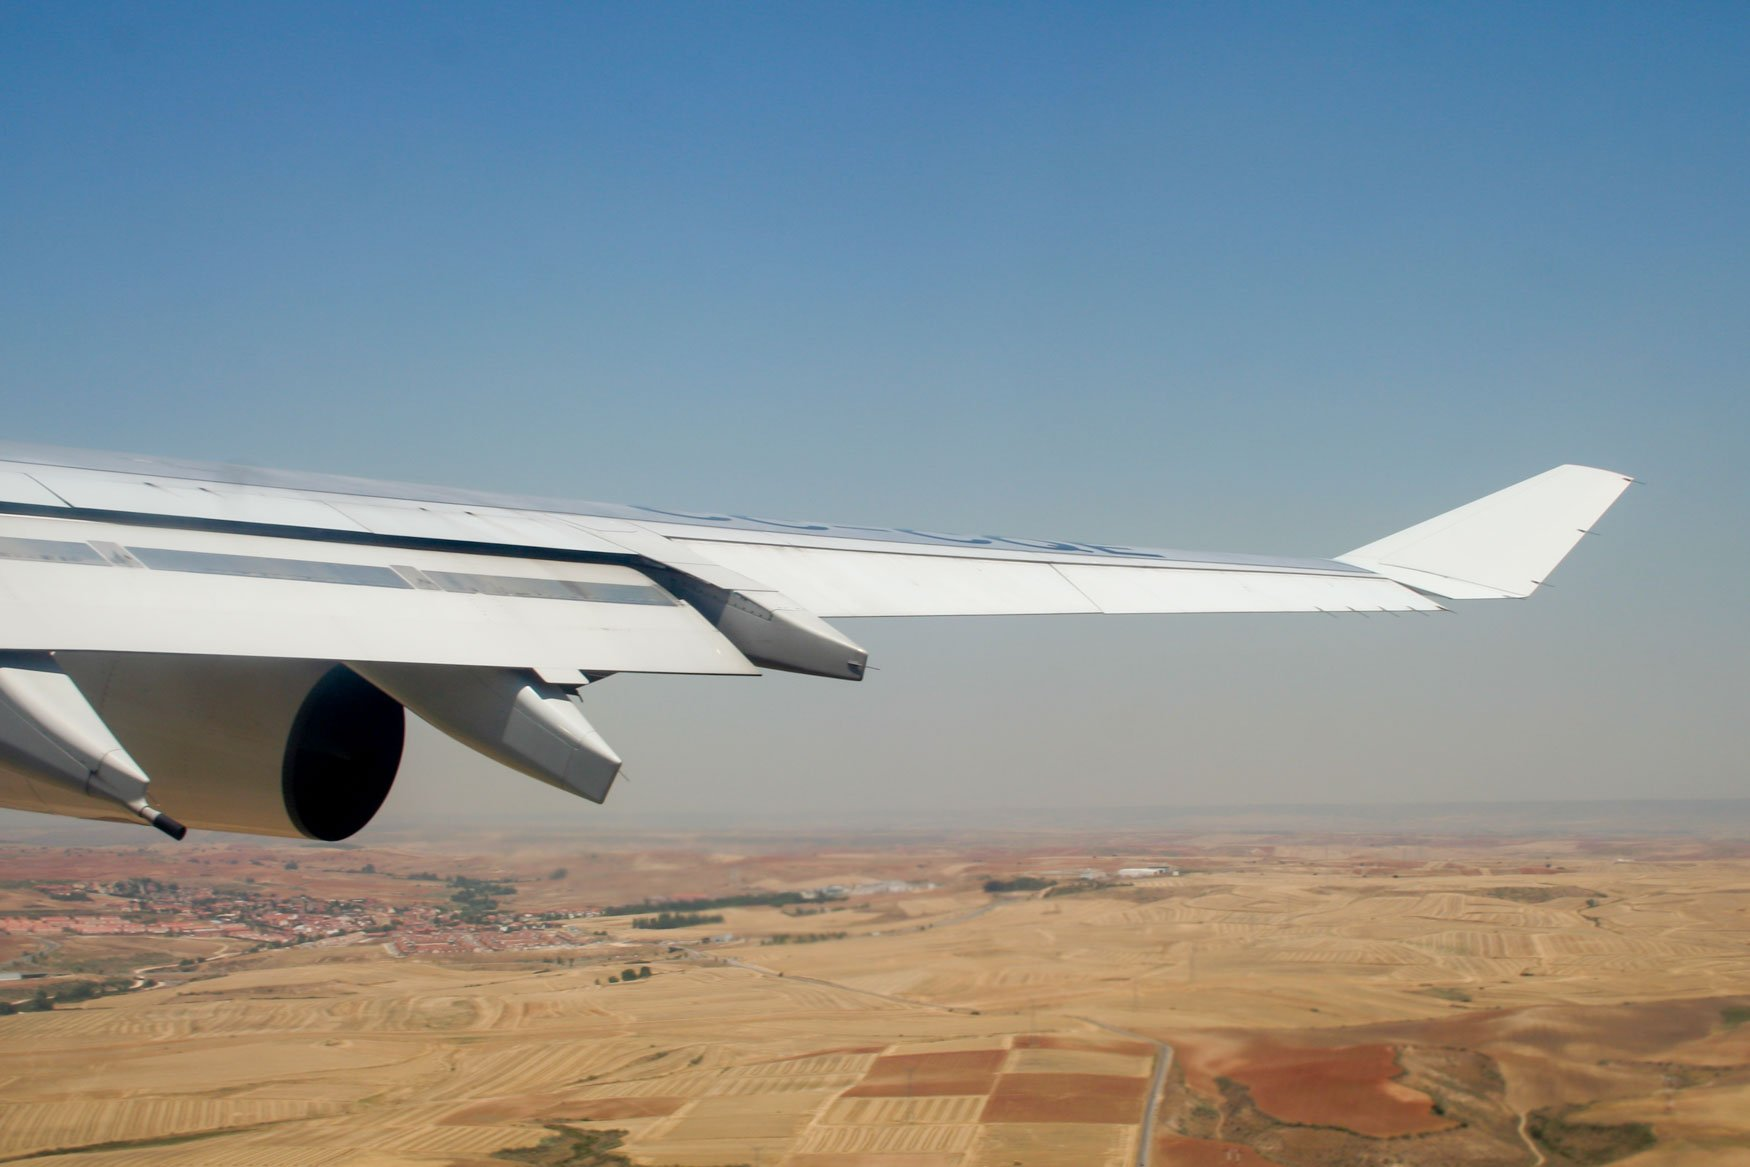 LAN Chile A340-300